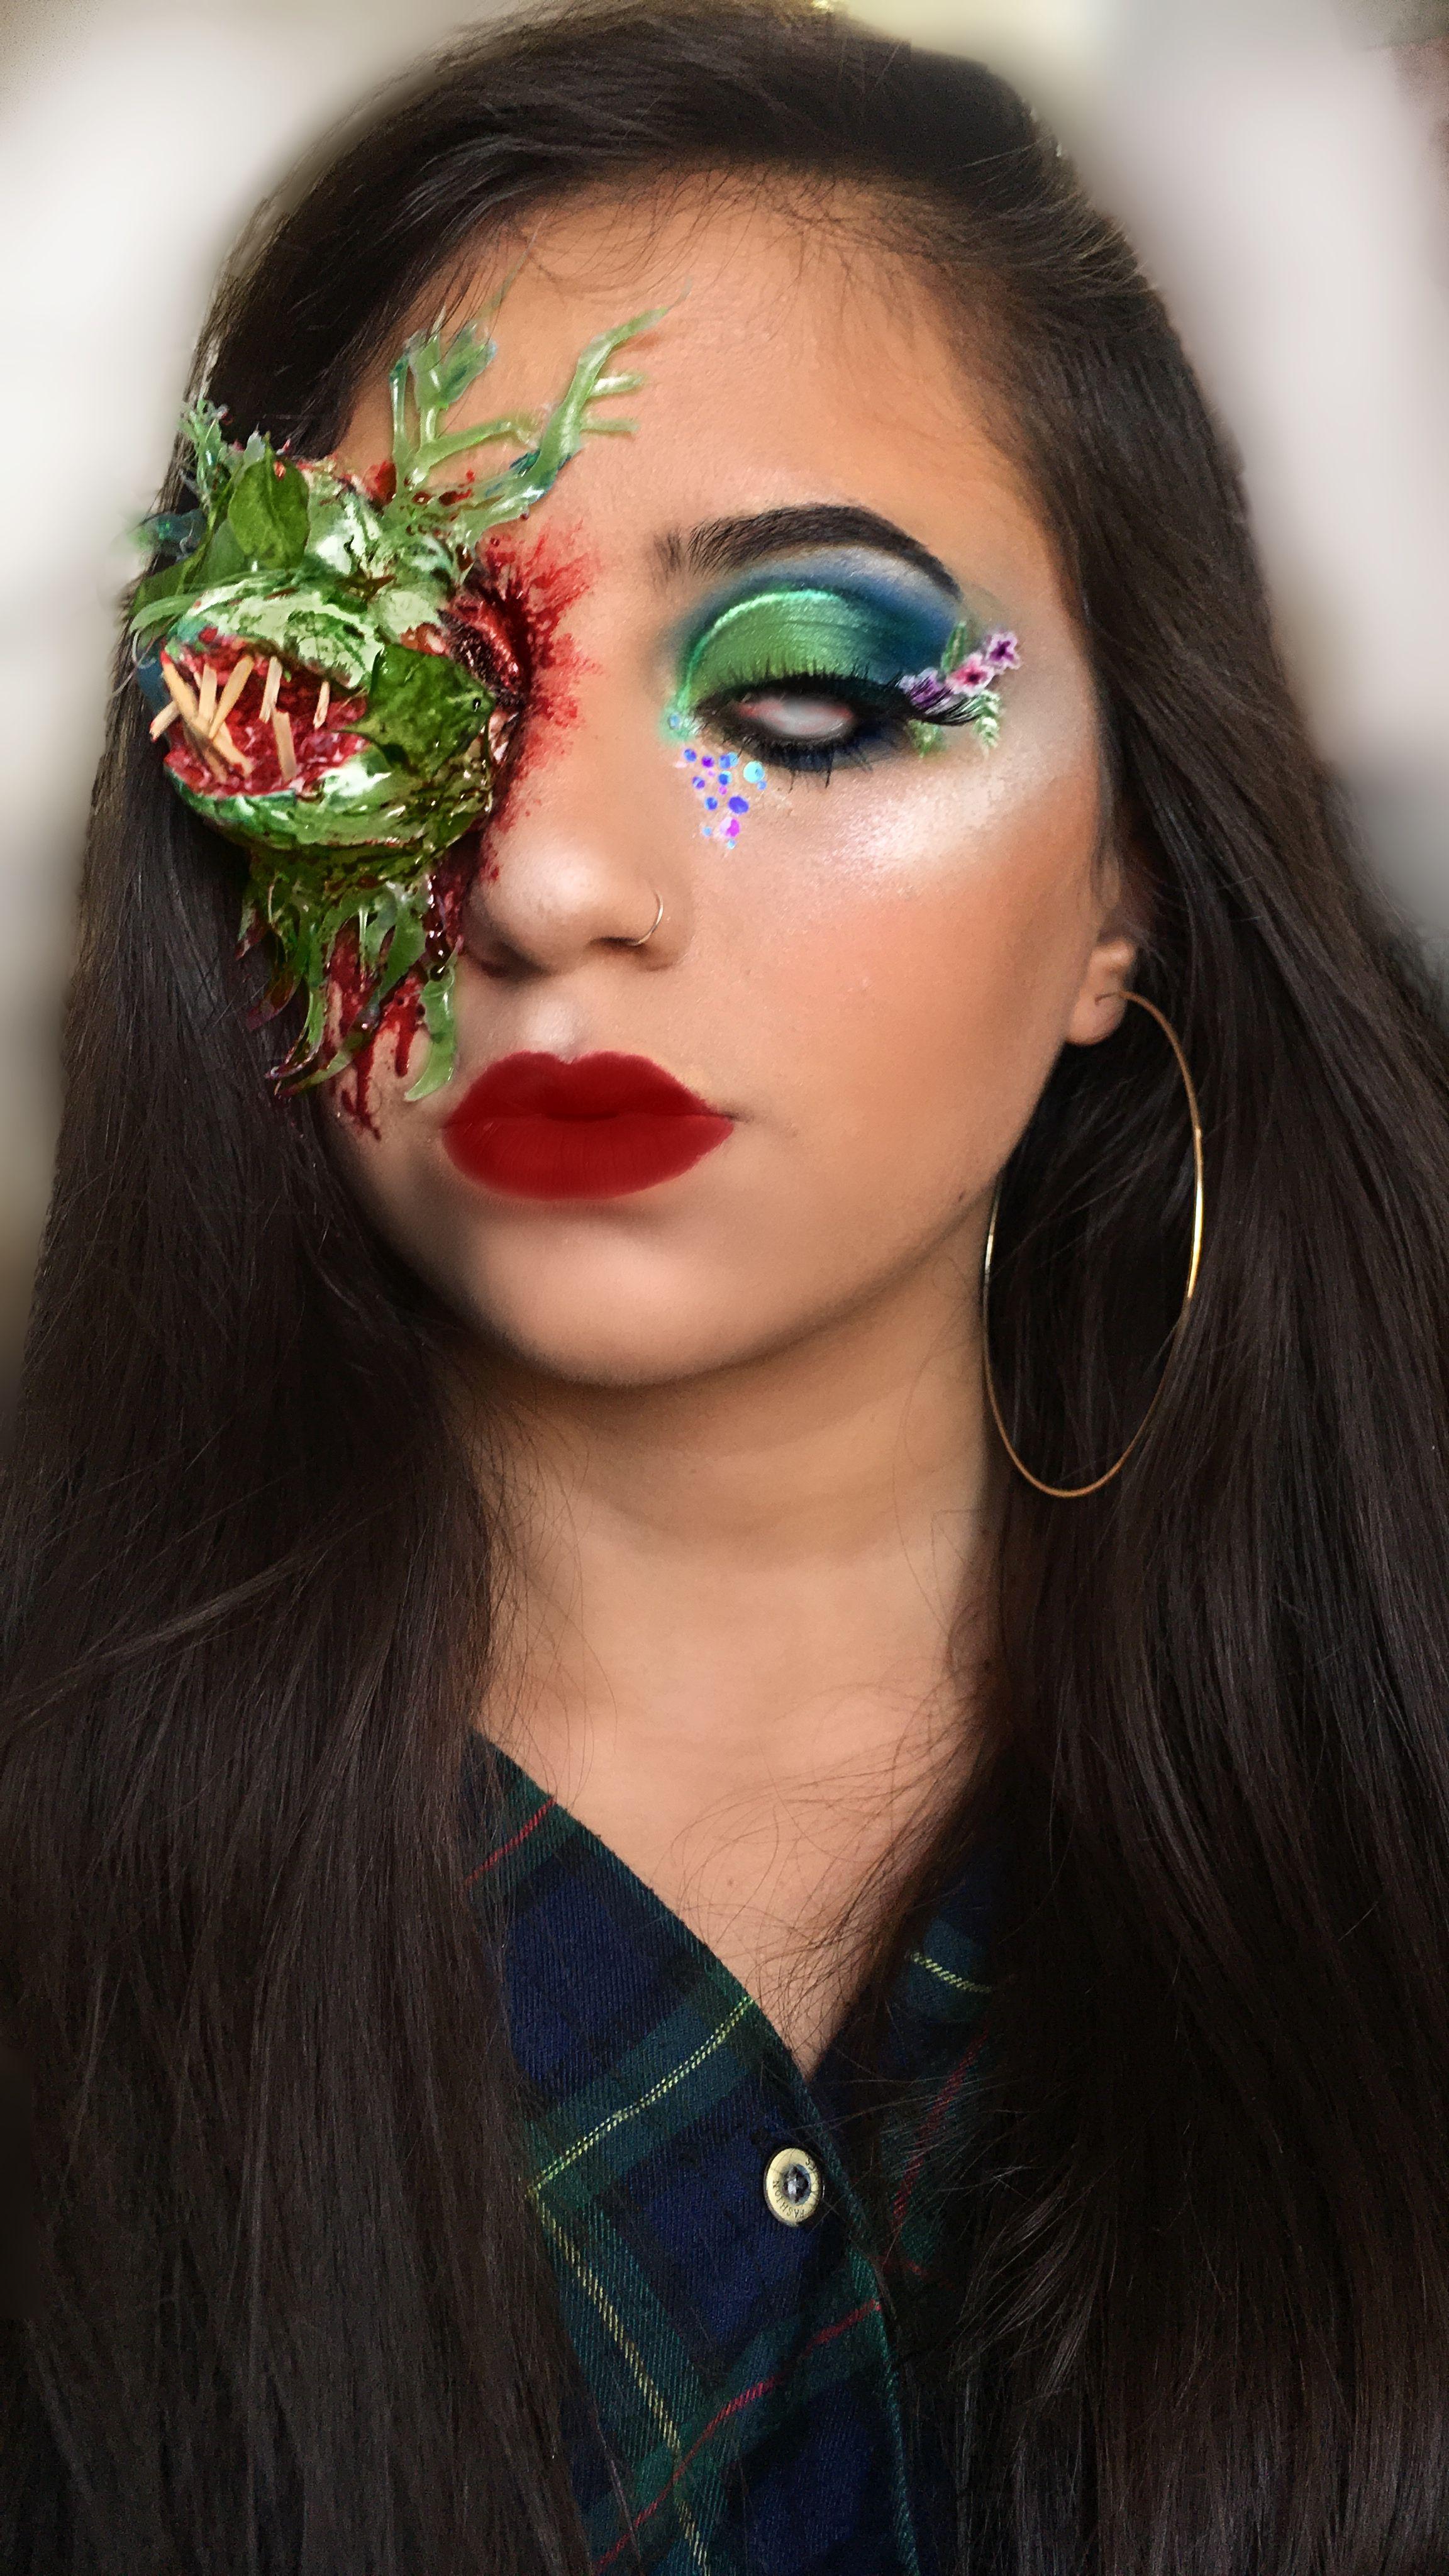 Eating Flower Wild Flower Makeup Look Poison Ivy Halloween Special Fx Sfx Makeup Creative Alin Shabta Flower Makeup Halloween Makeup Inspiration Fantasy Makeup